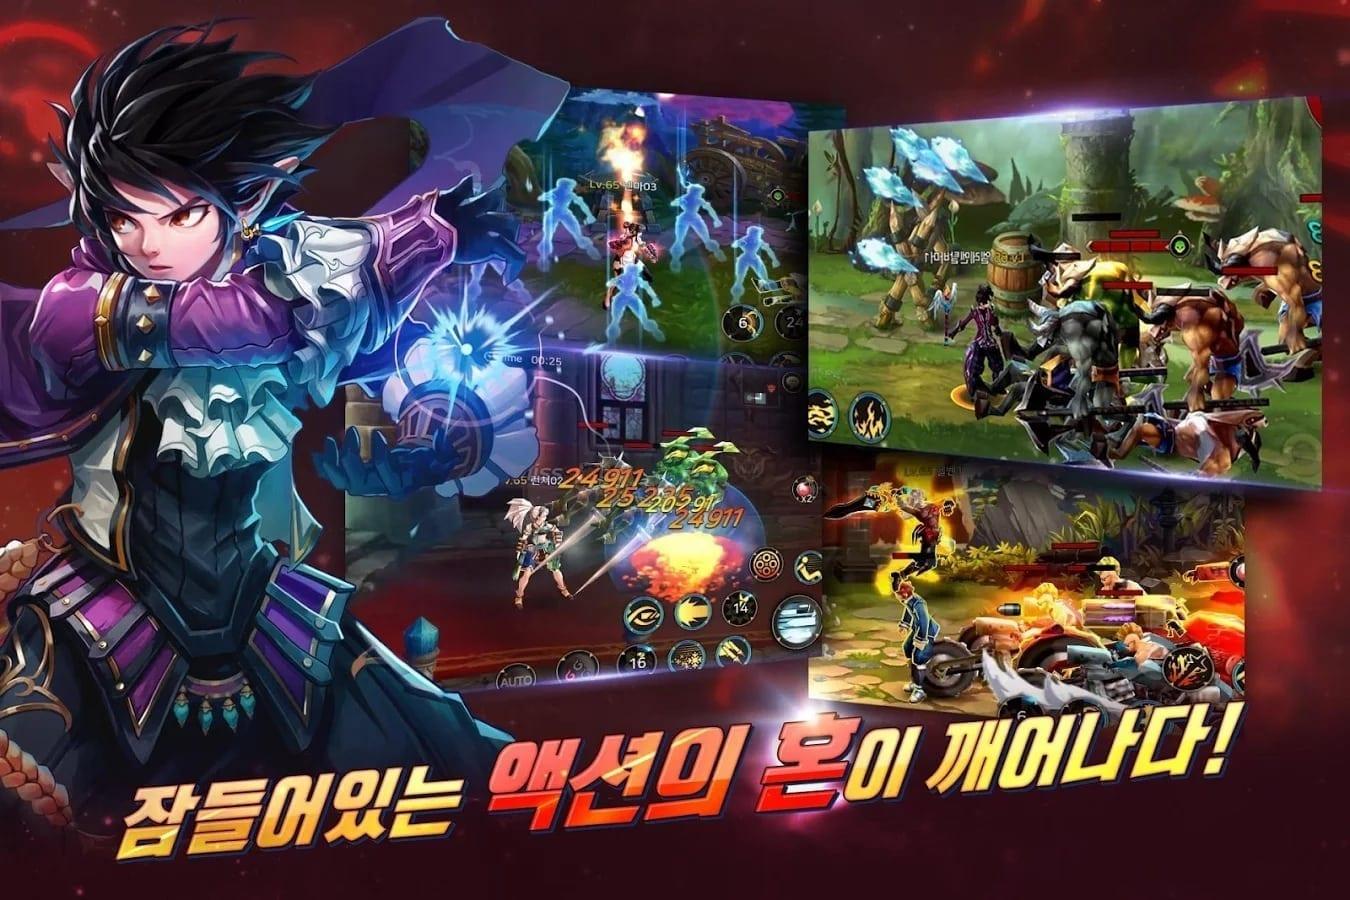 dungeon-fighter-spirit-google-play-image-2